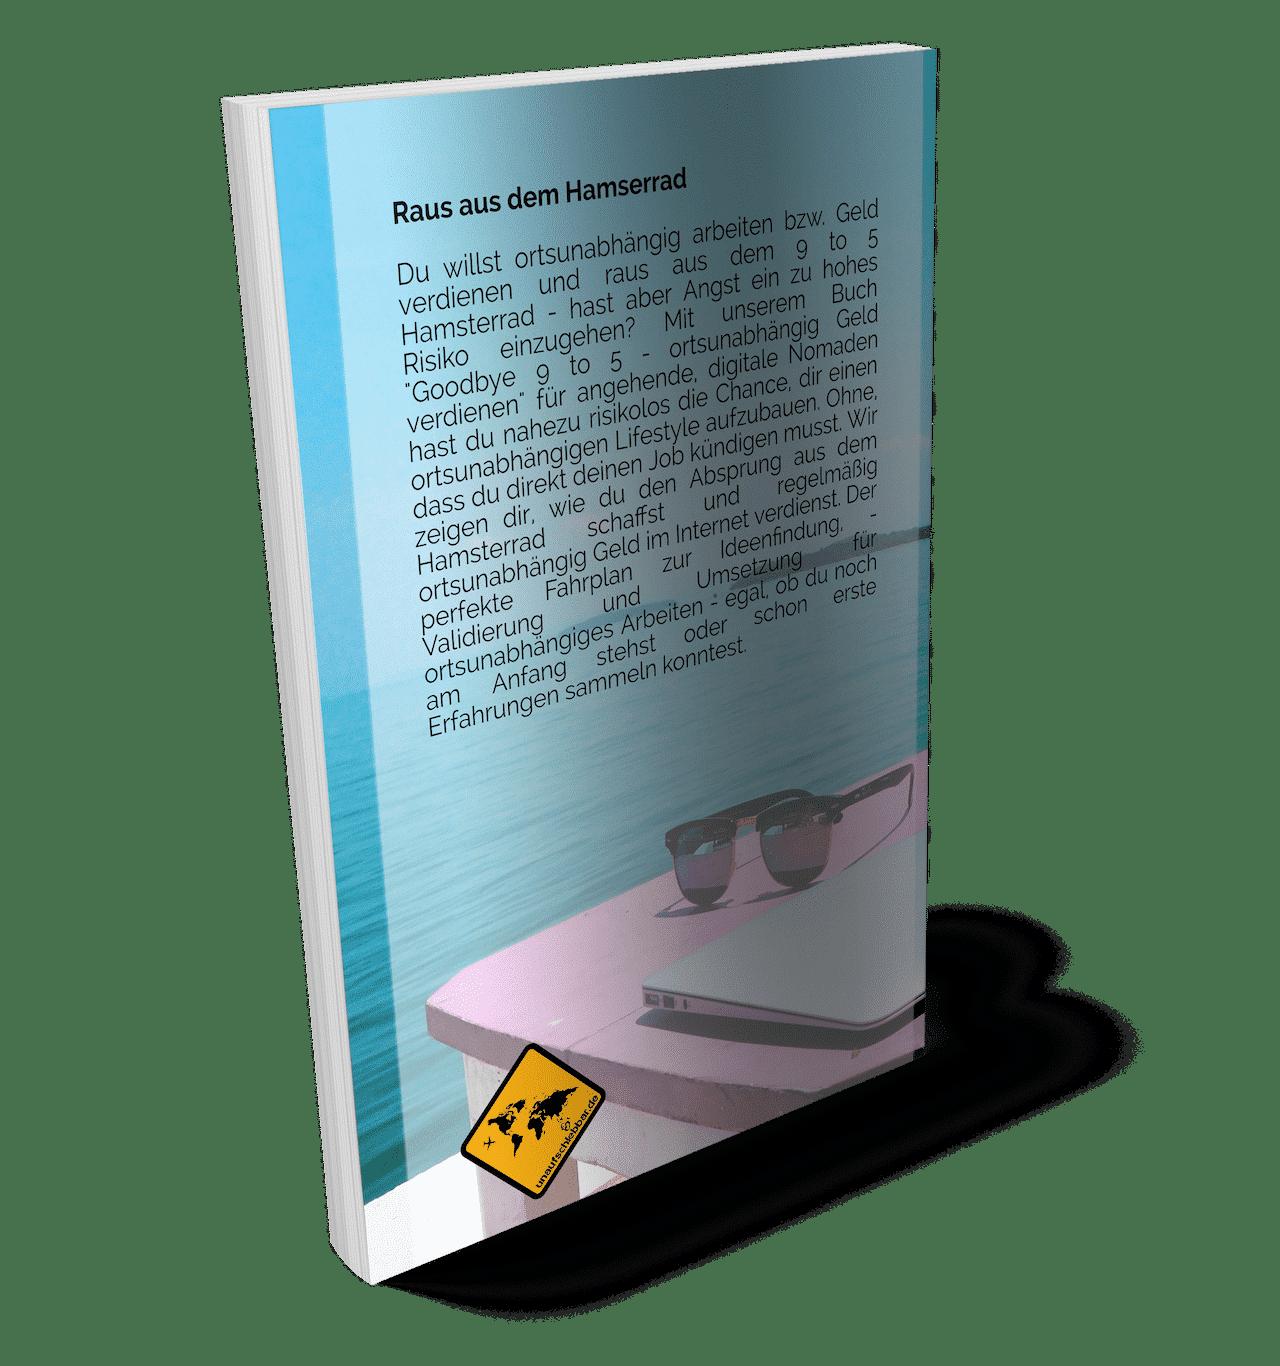 Goodbye 9 to 5 ortsunabhängig Geld verdienen - Cover - Free Plus Shipping Rückseite